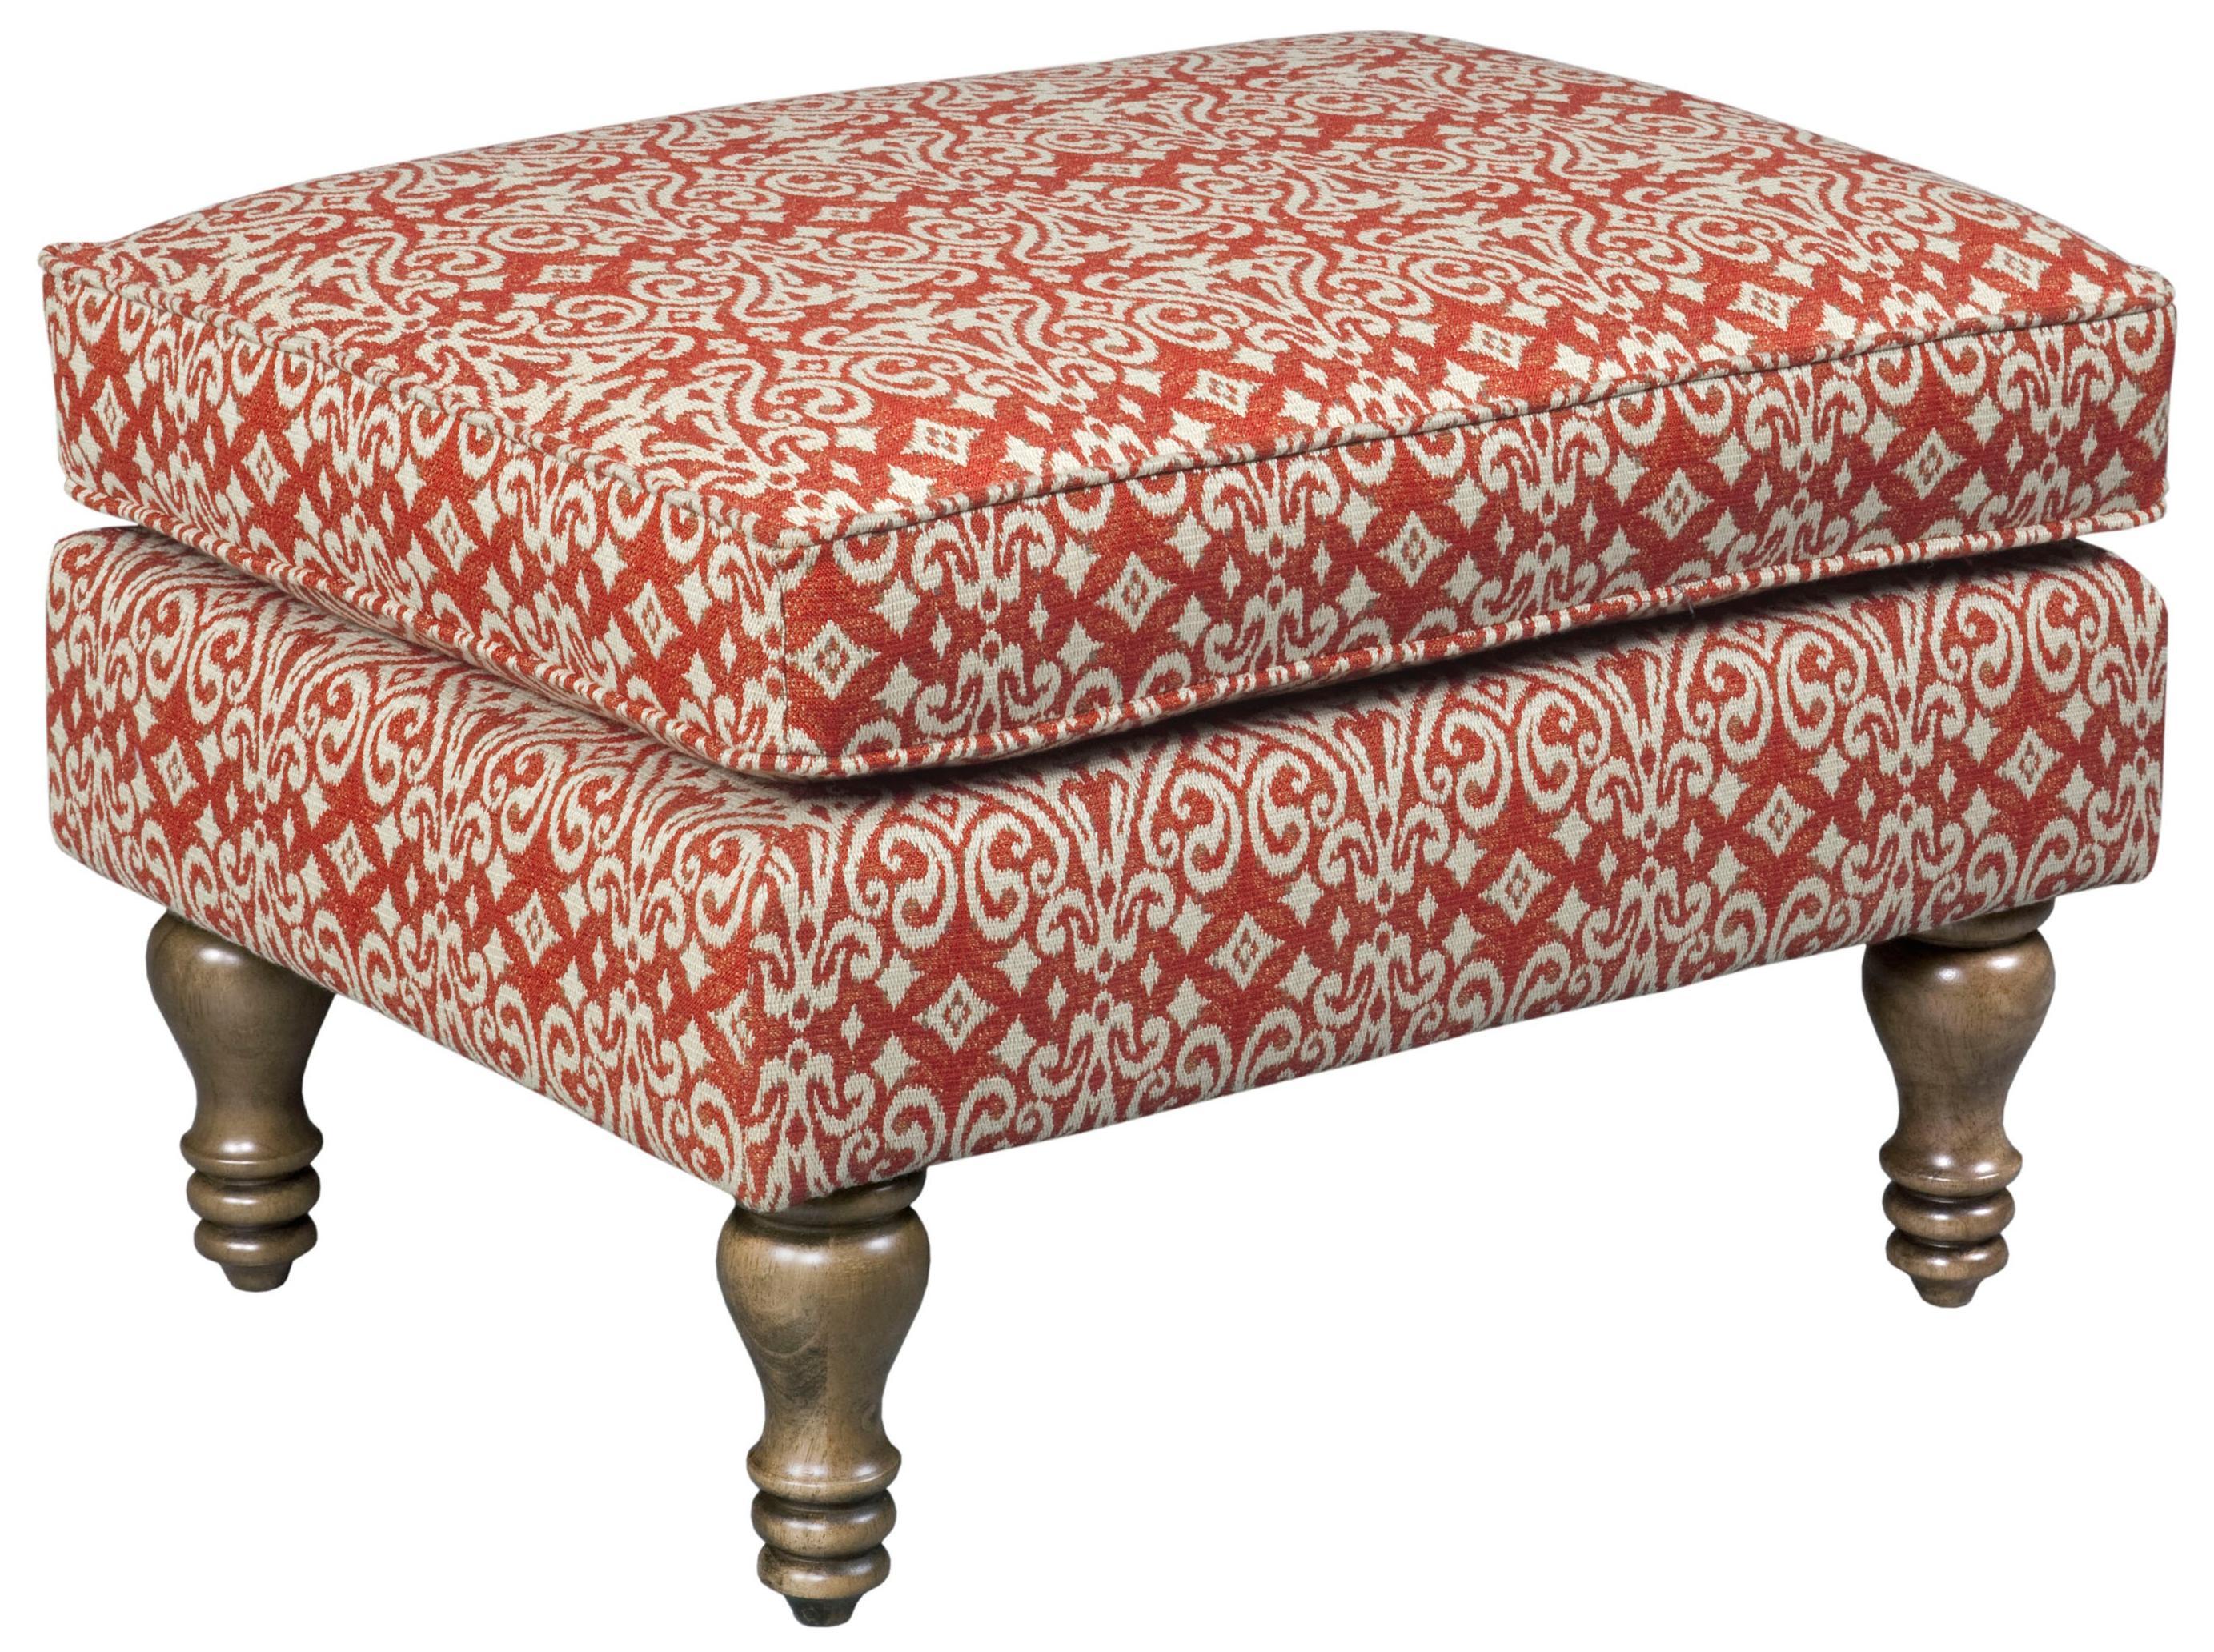 Broyhill Furniture Fiona 9077 5 Transitional Chair Ottoman John V Schultz Furniture Ottomans